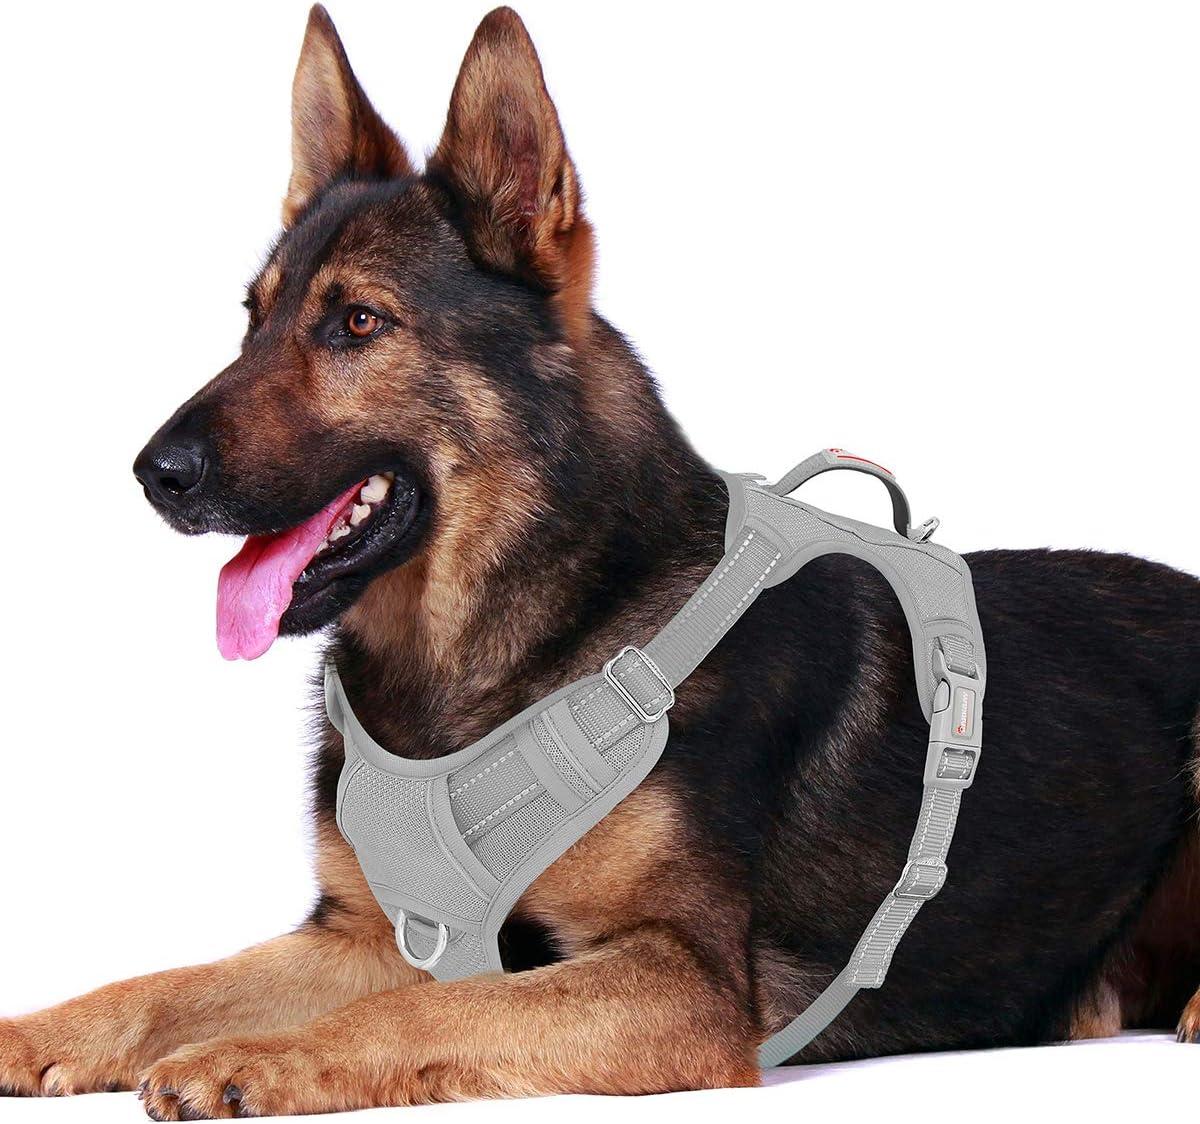 BARKBAY No Pull Dog Harness Review